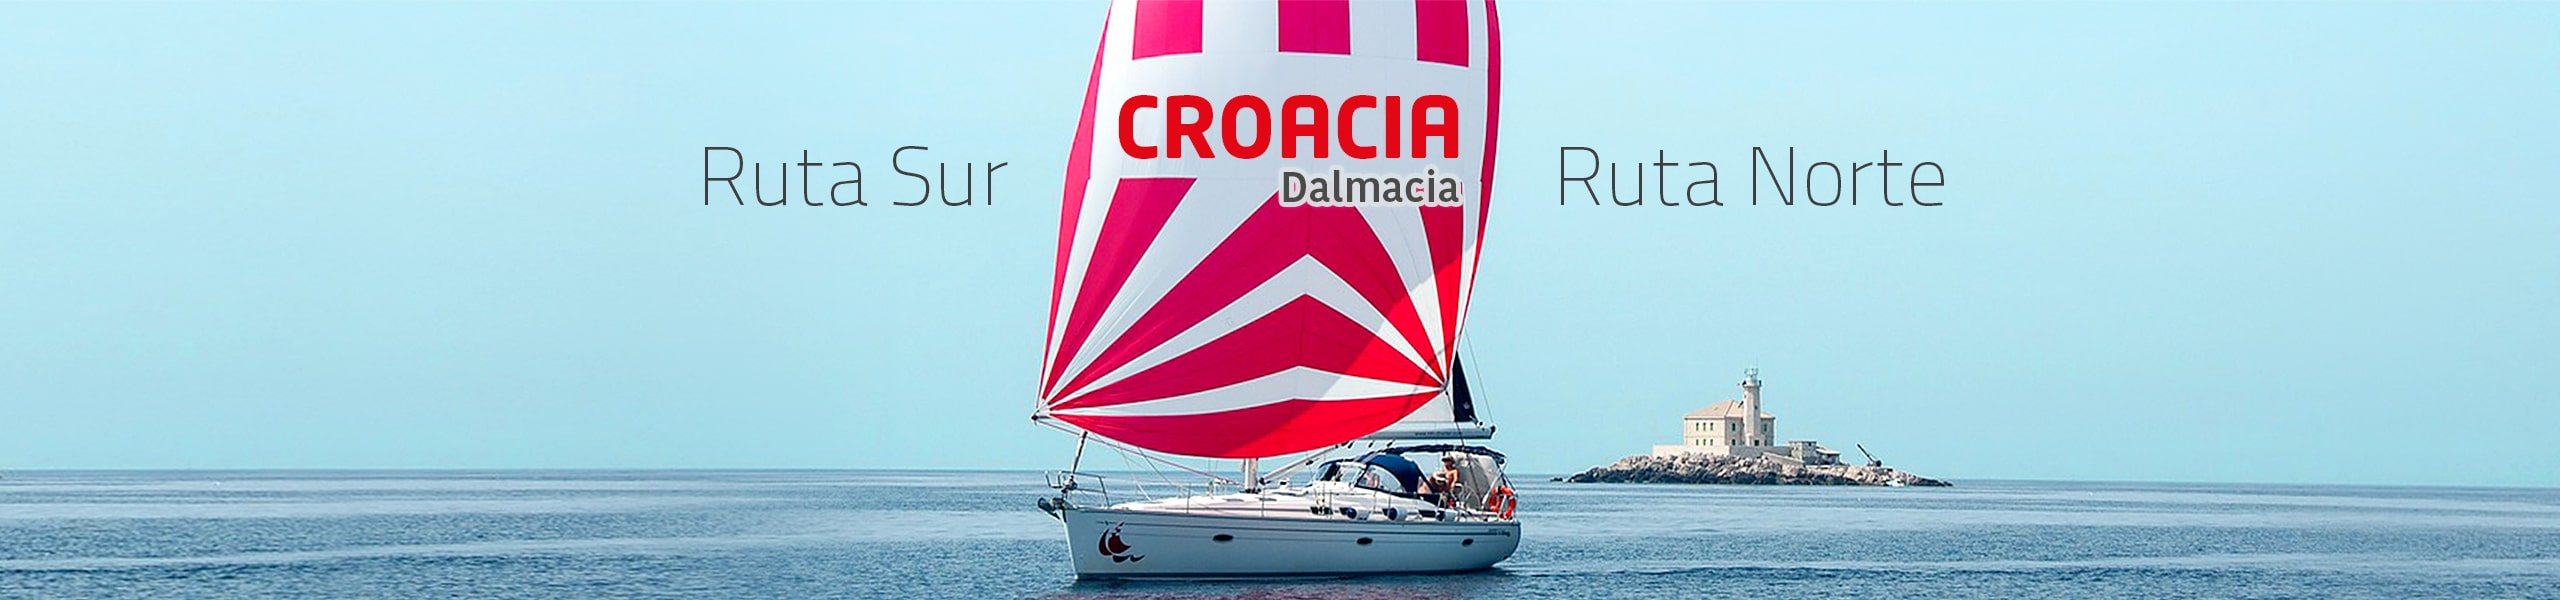 Velero plaza a plaza por Croacia